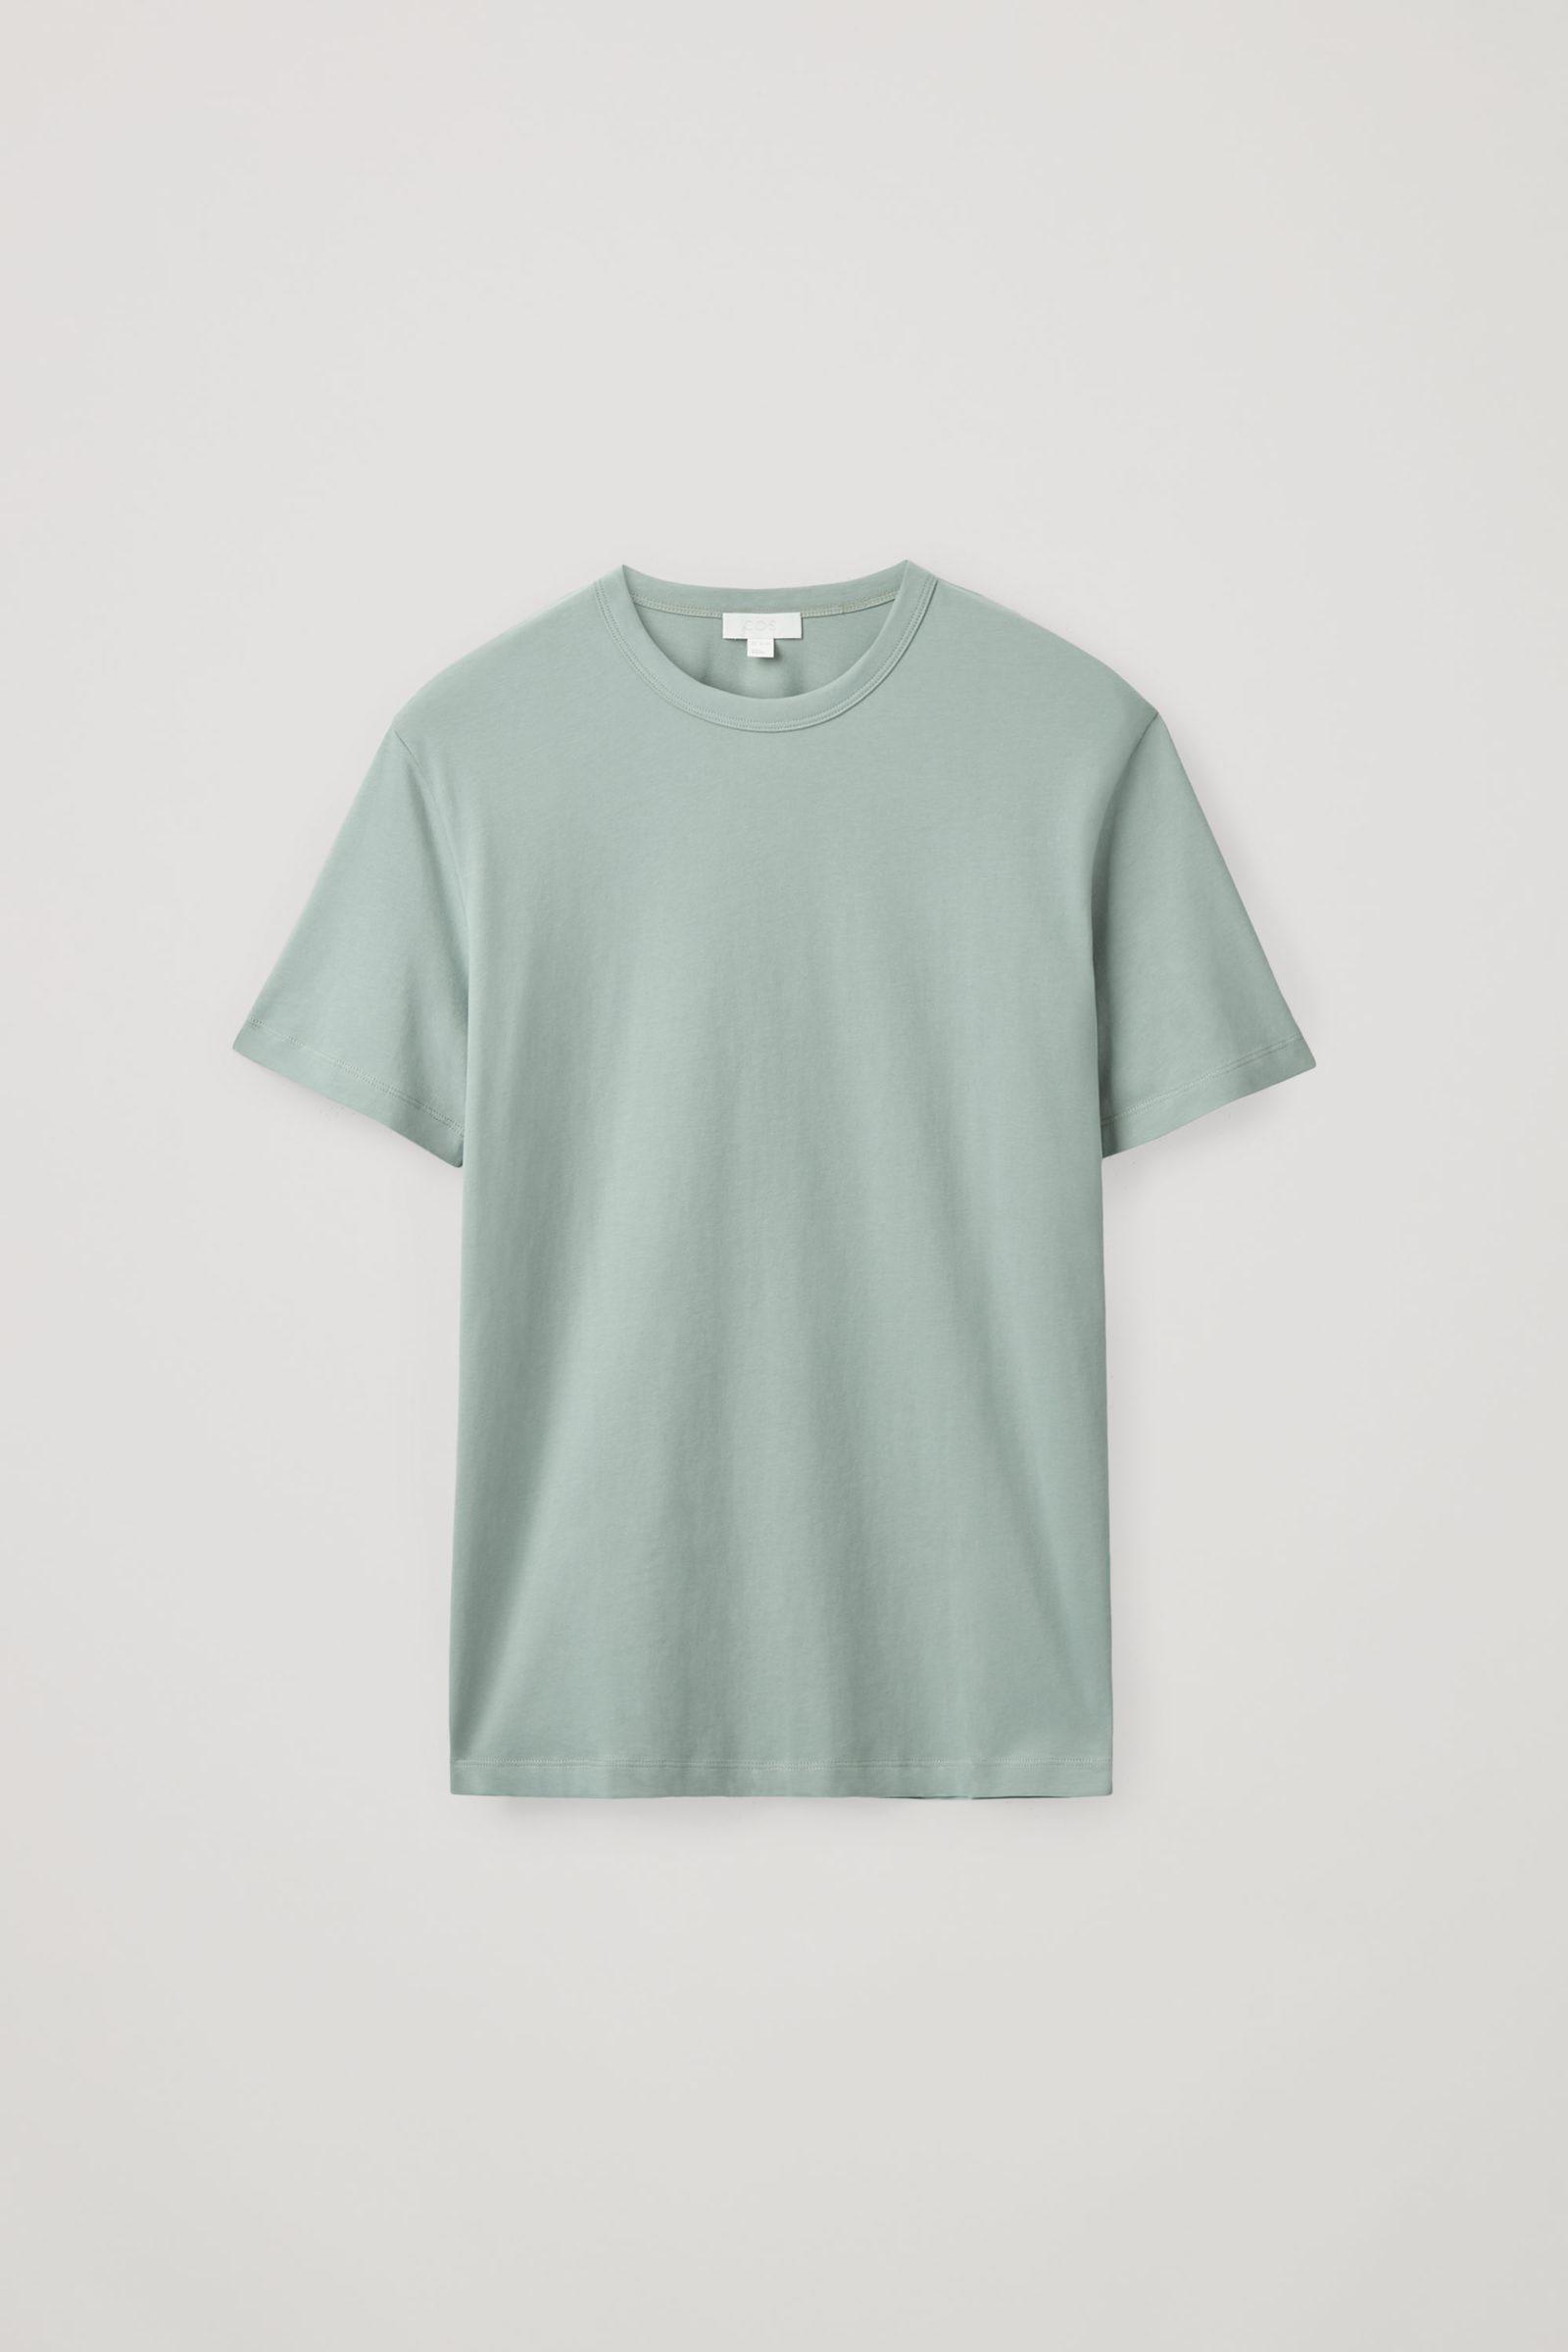 COS 브러쉬드 코튼 티셔츠의 더스티 그린컬러 Product입니다.